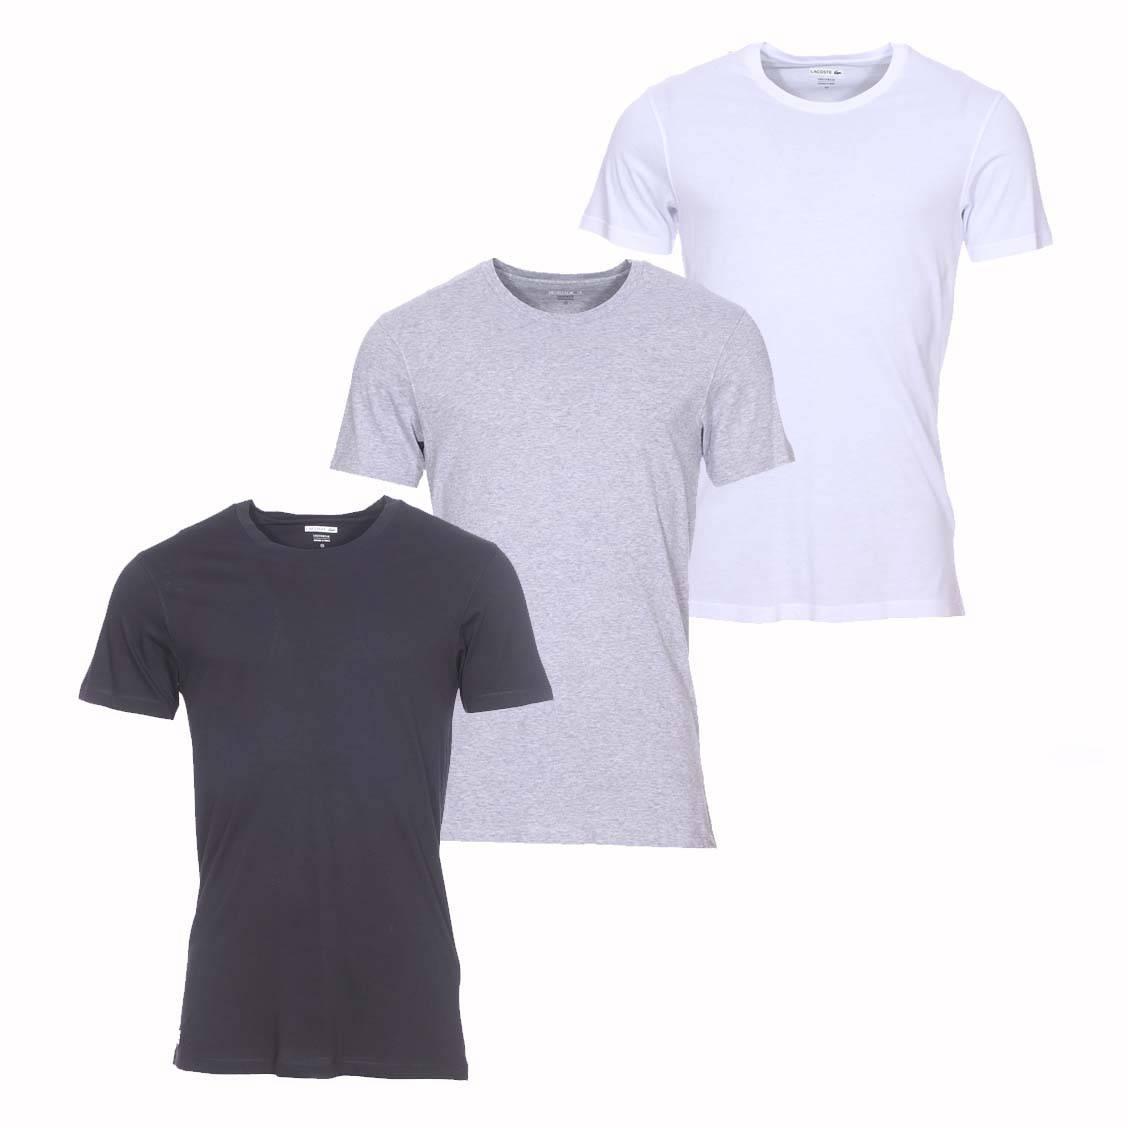 lot de 3 tee shirts col rond lacoste essentiels 100 coton. Black Bedroom Furniture Sets. Home Design Ideas